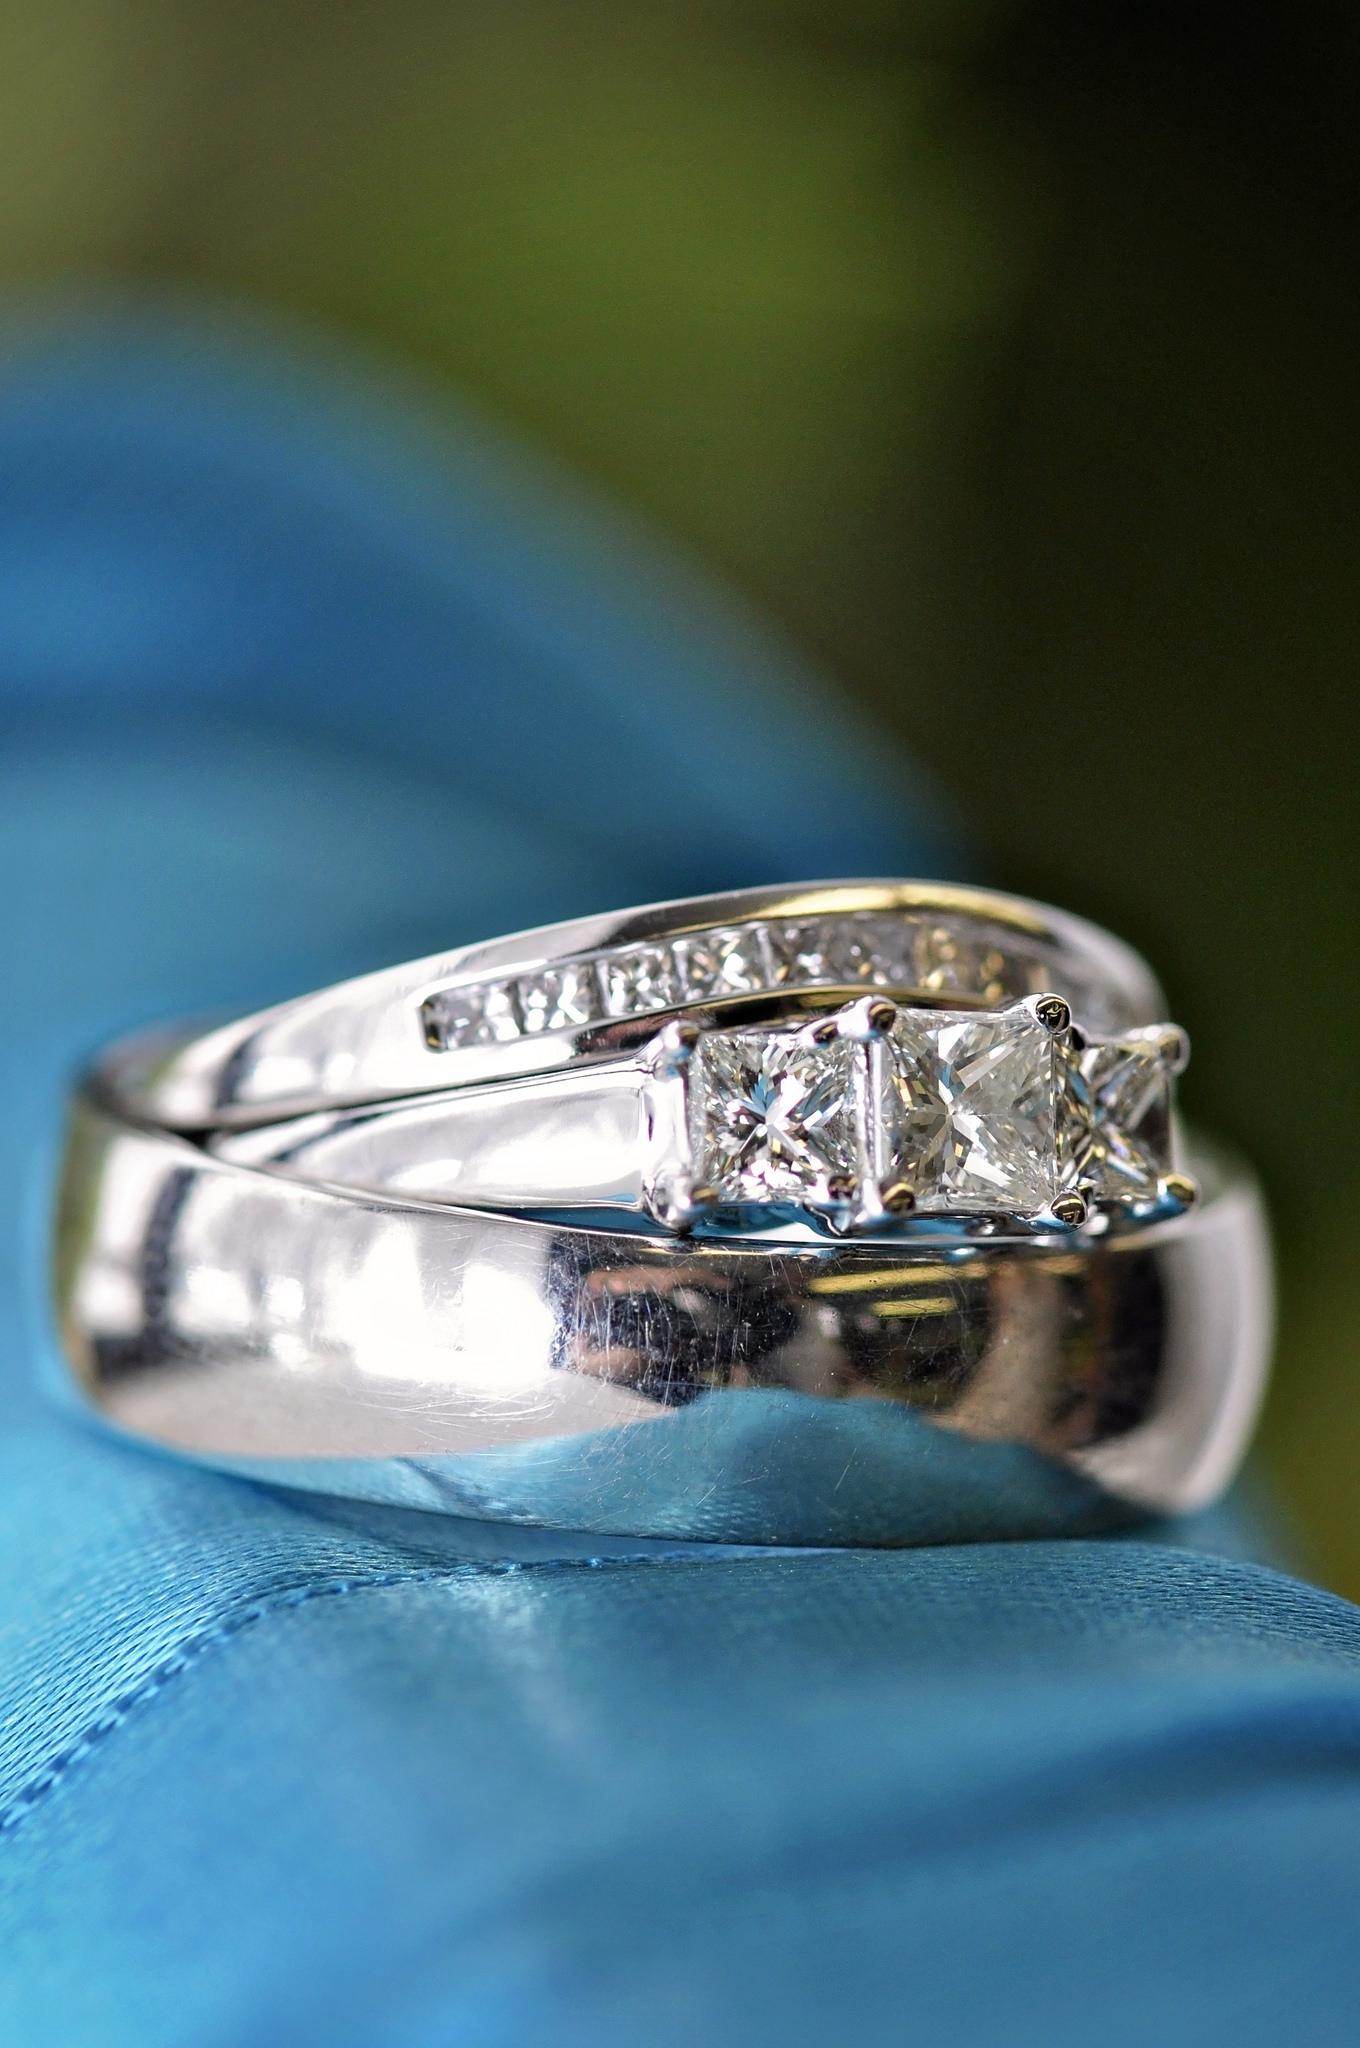 kristine_wedding_rings_spiritedtable_photo03.jpg